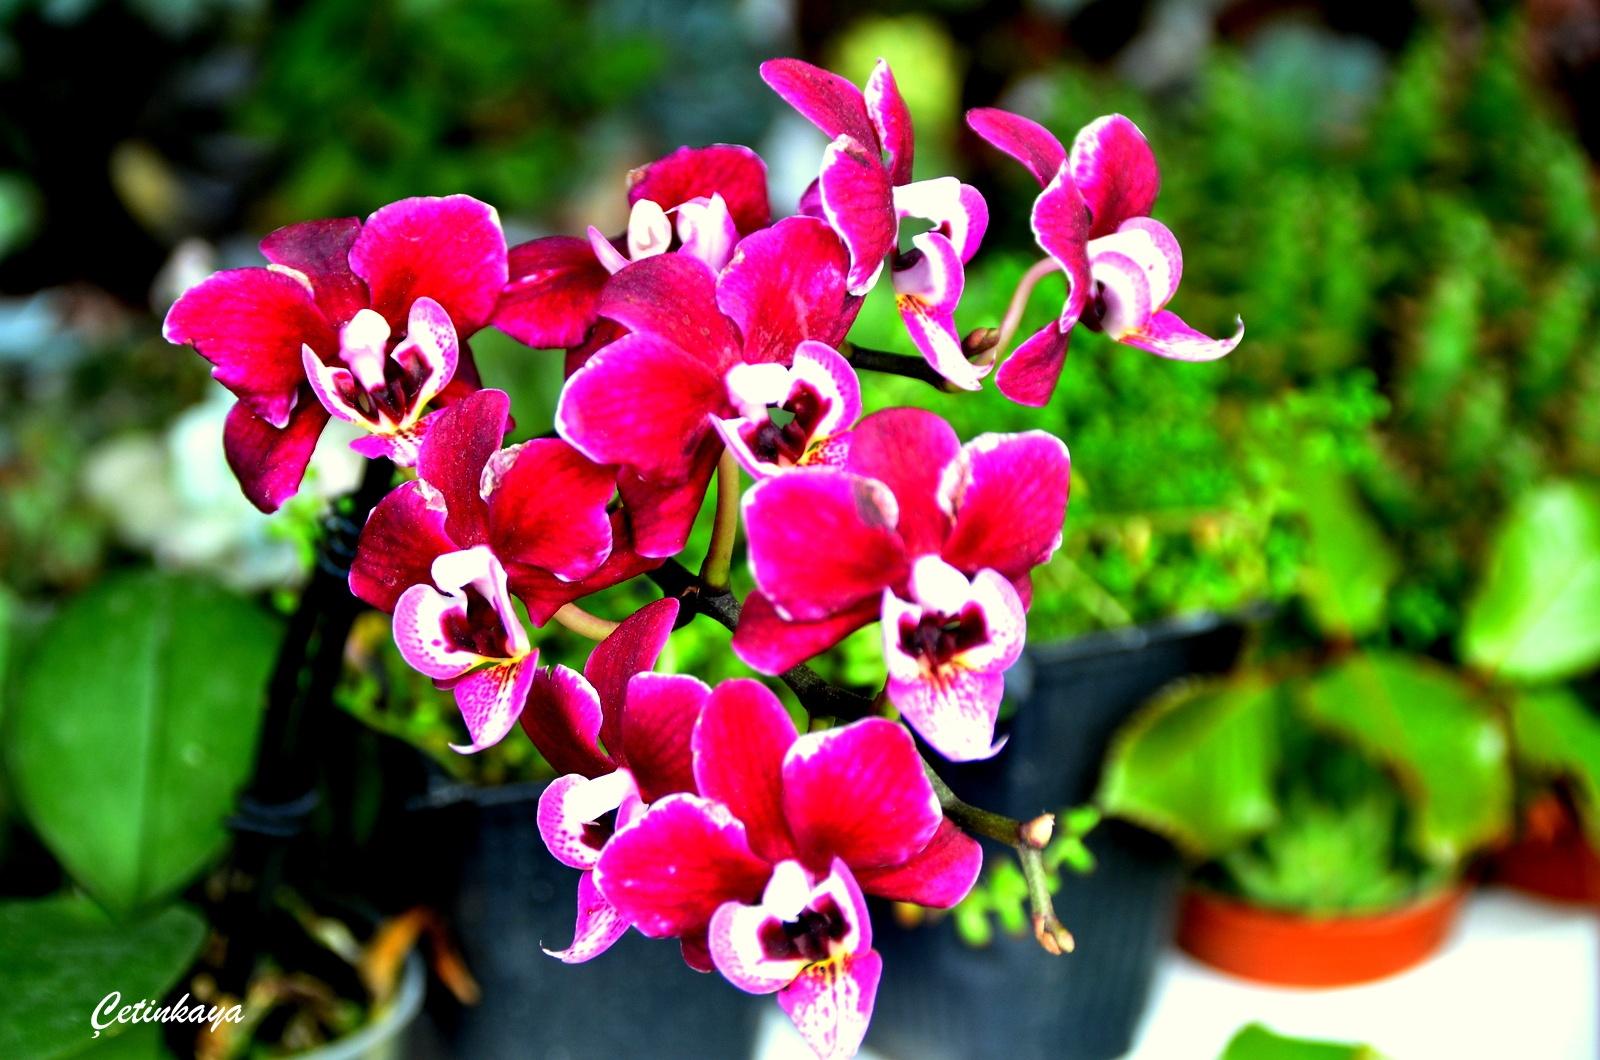 flower by minas_cetinkaya